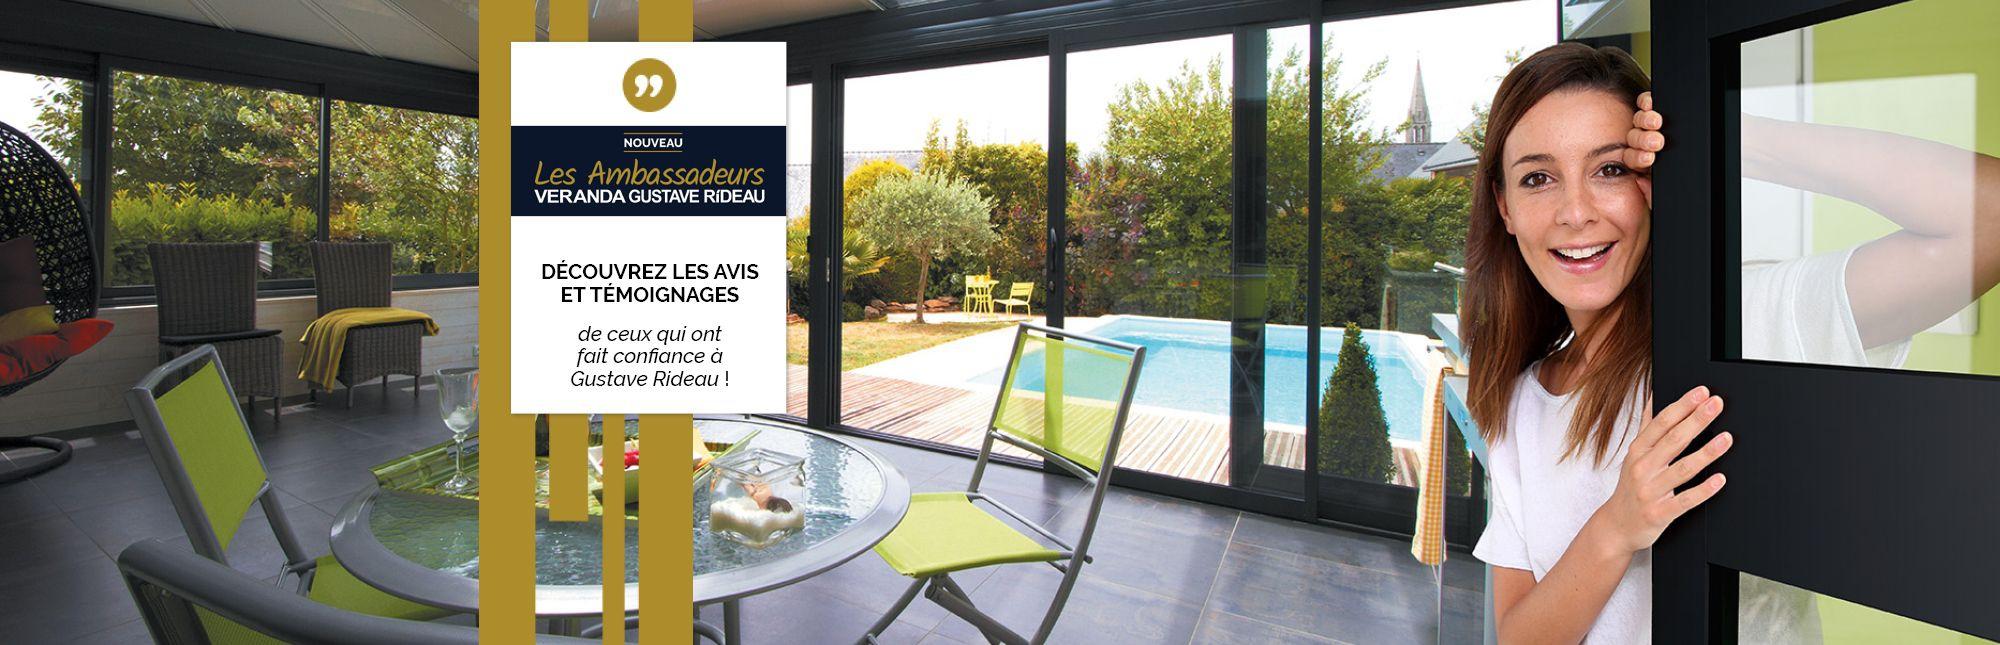 Abri De Terrasse En Aluminium: Fabrication Sur Mesure - Abri ... serapportantà Abri Pour Terrasse